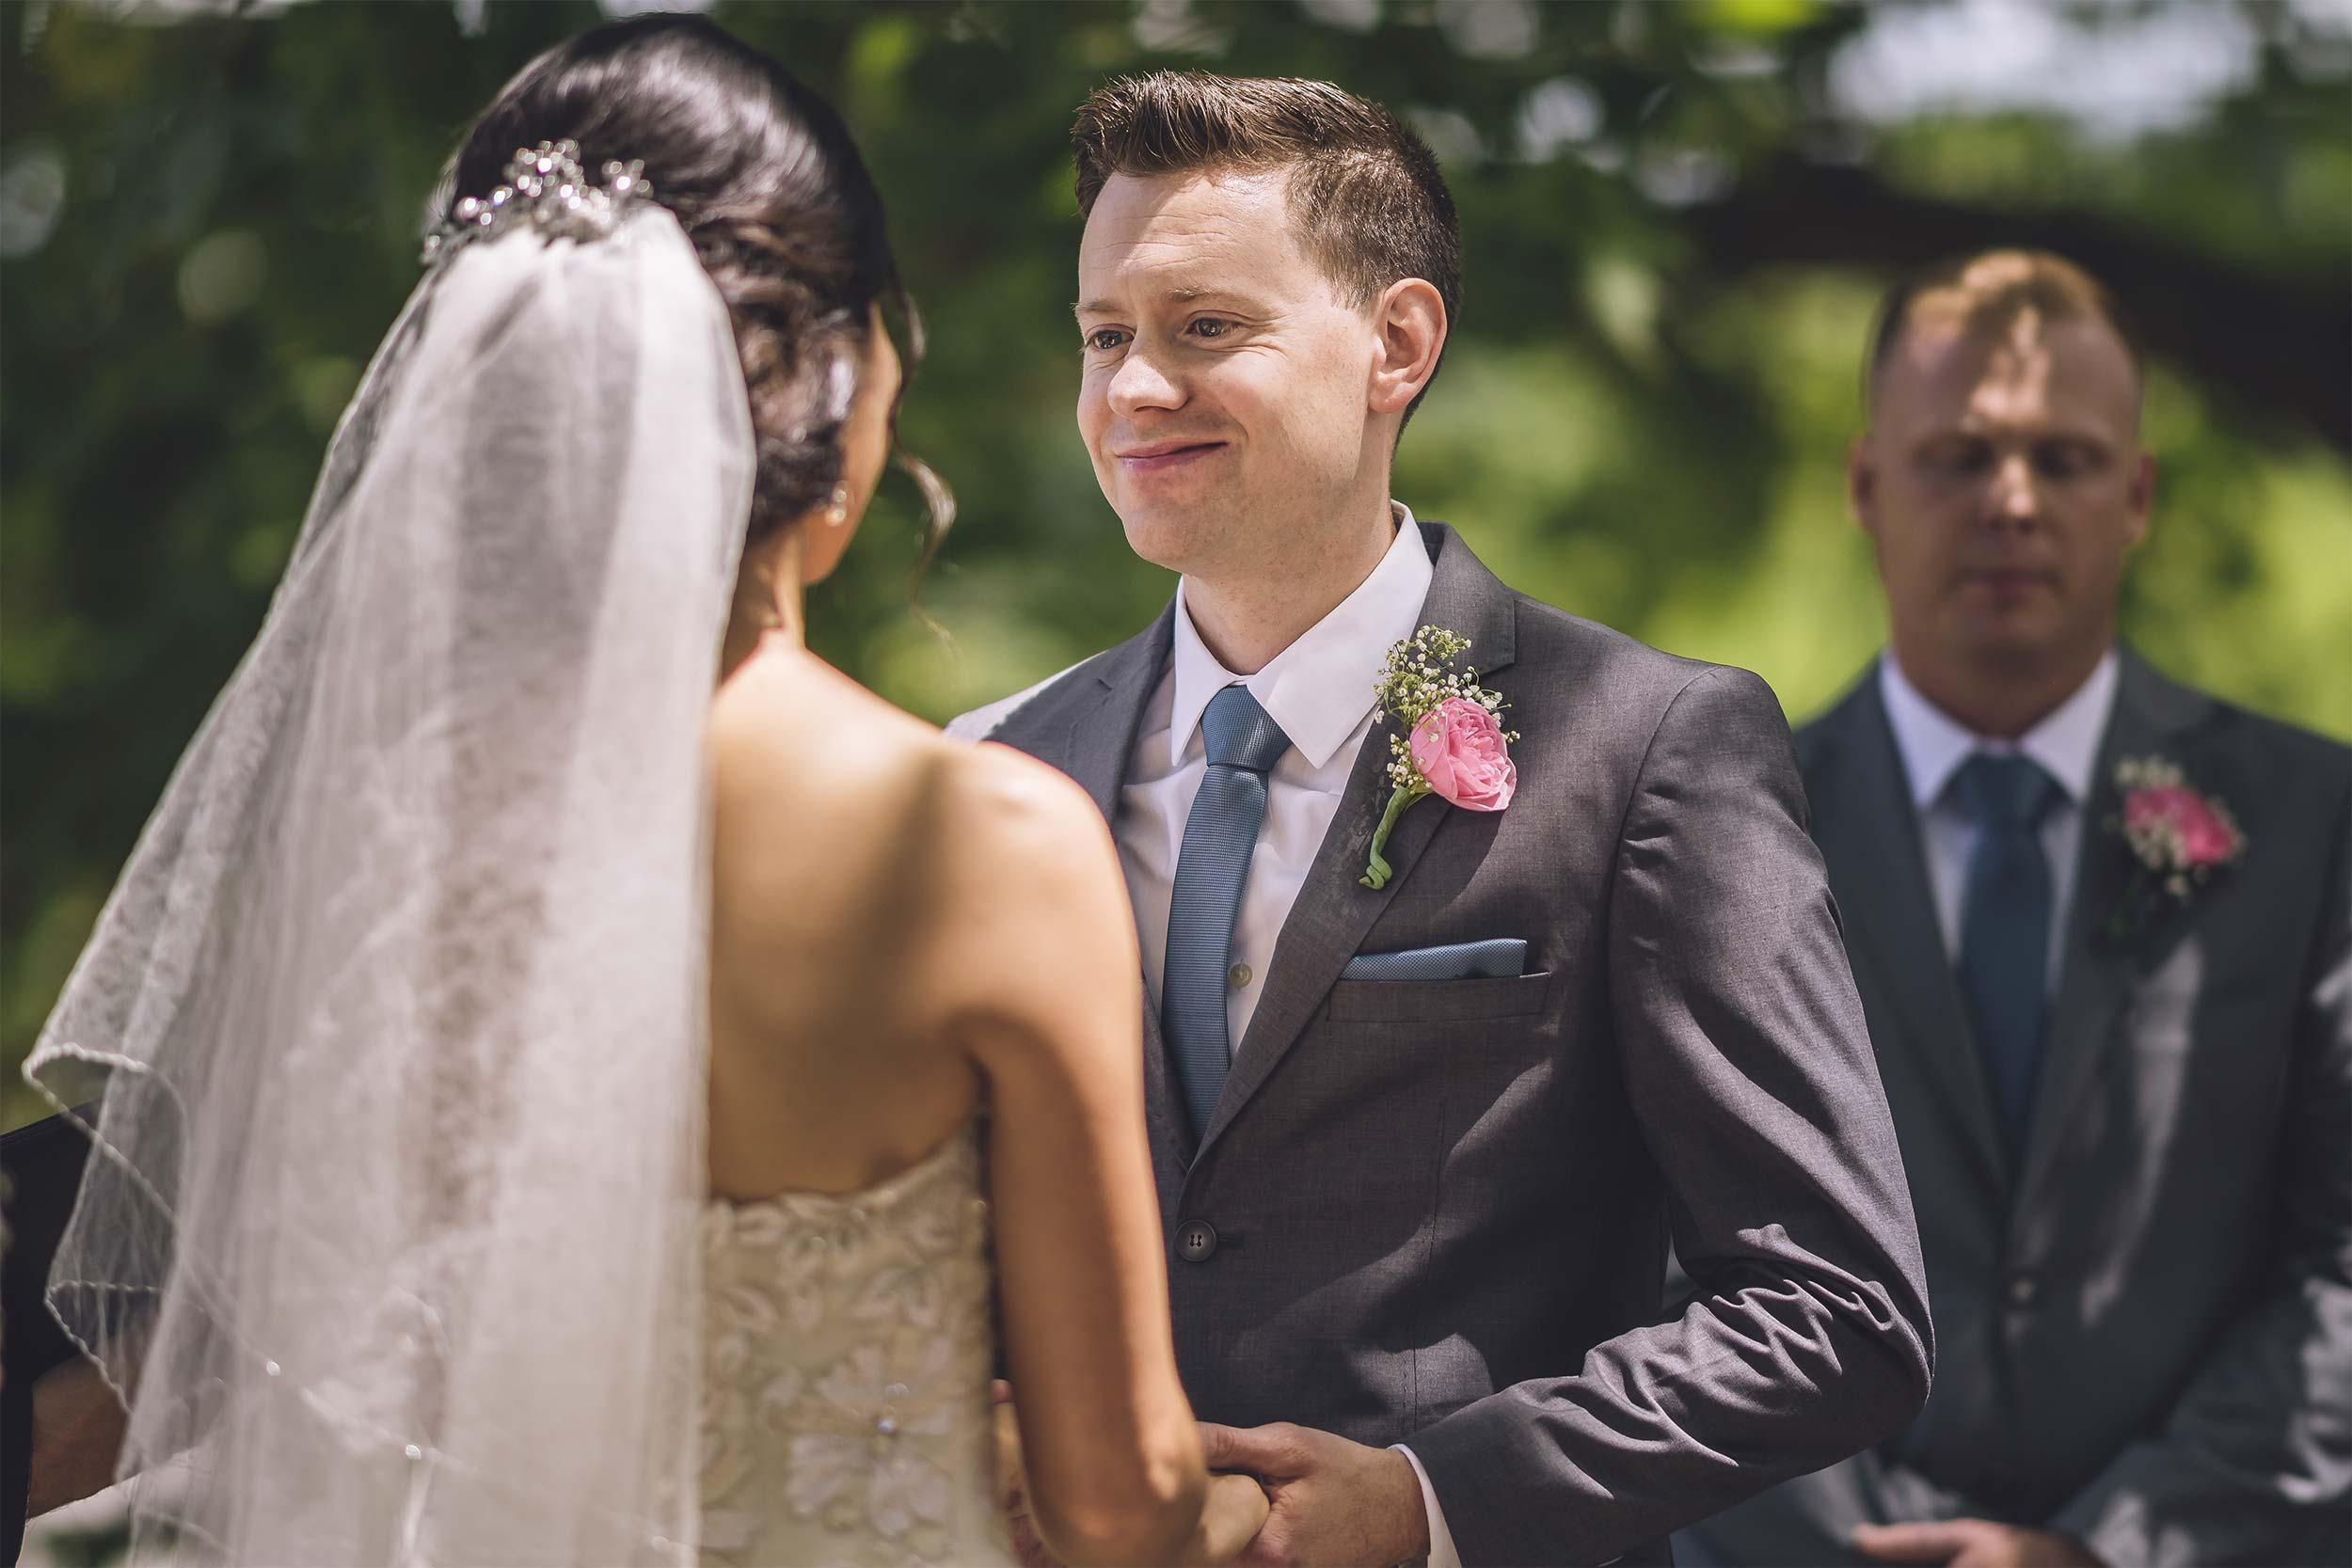 emotional-groom-wedding-ceremony-darby-house.jpg